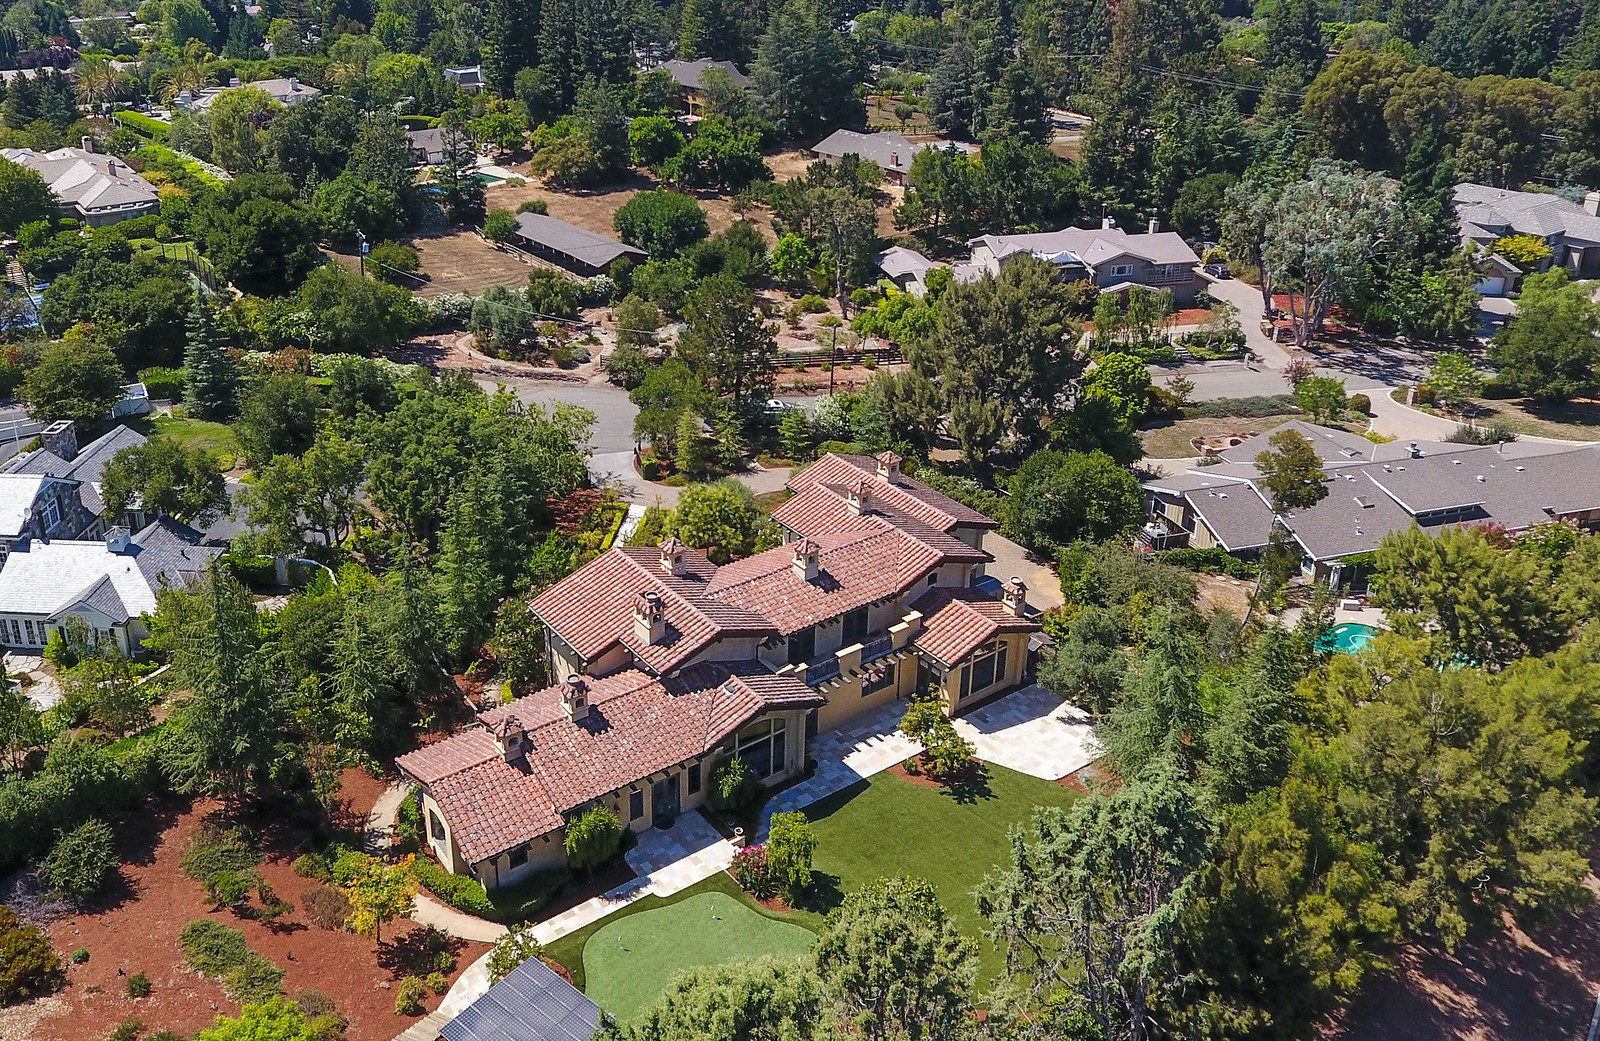 13936 Fremont Pines Ln Drone Los Altos Hills Blu Skye Media Drone-0014-X3.jpg